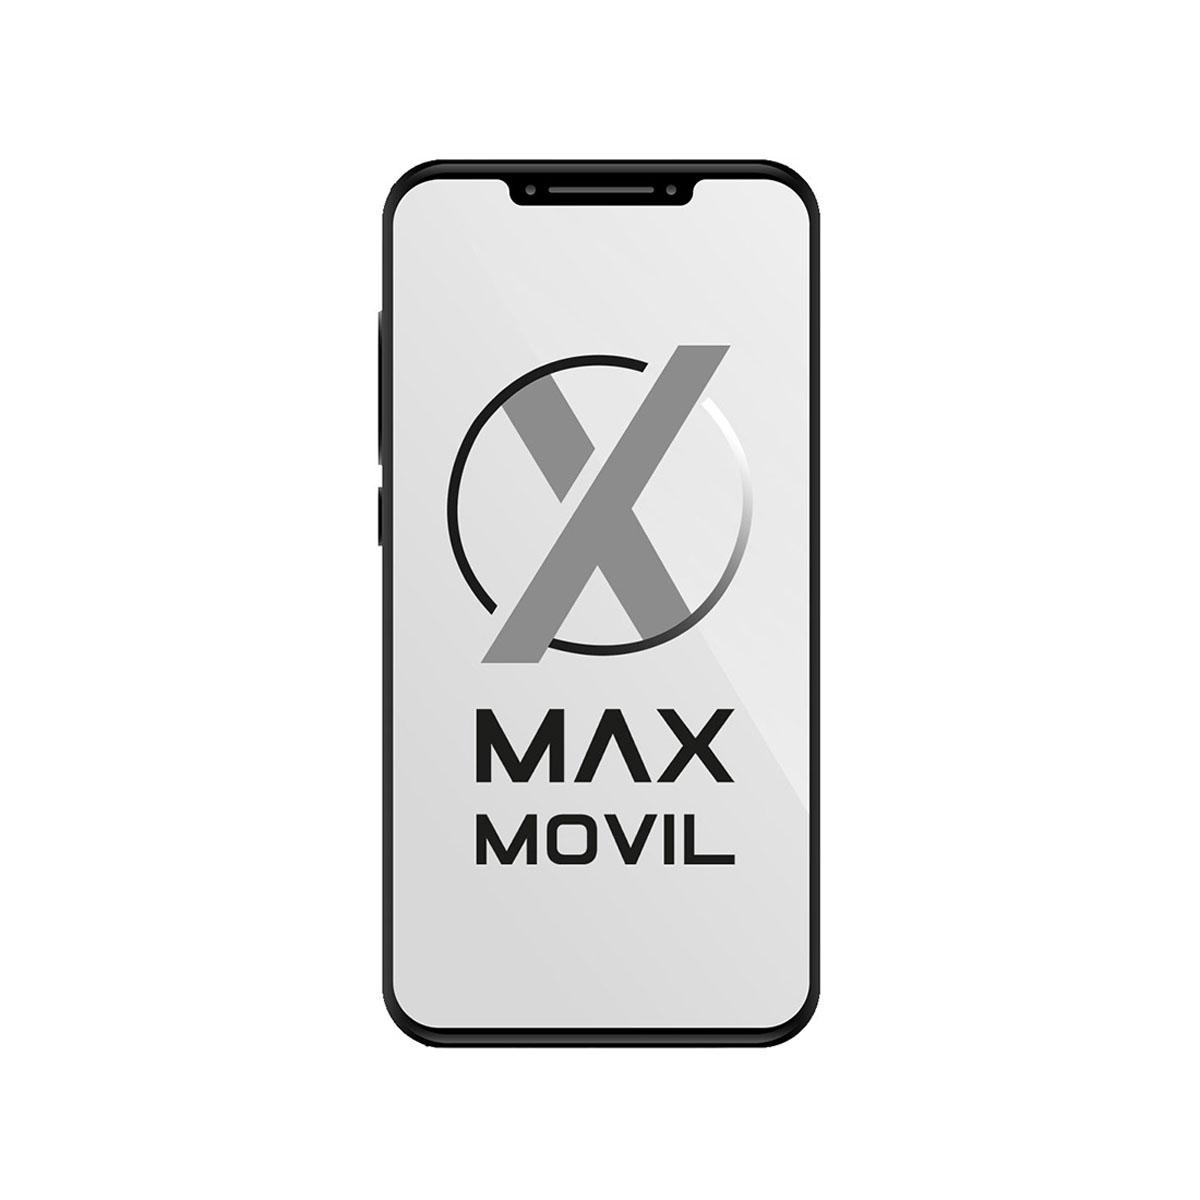 Apple iPhone 11 Reacondicionado 64GB Malva